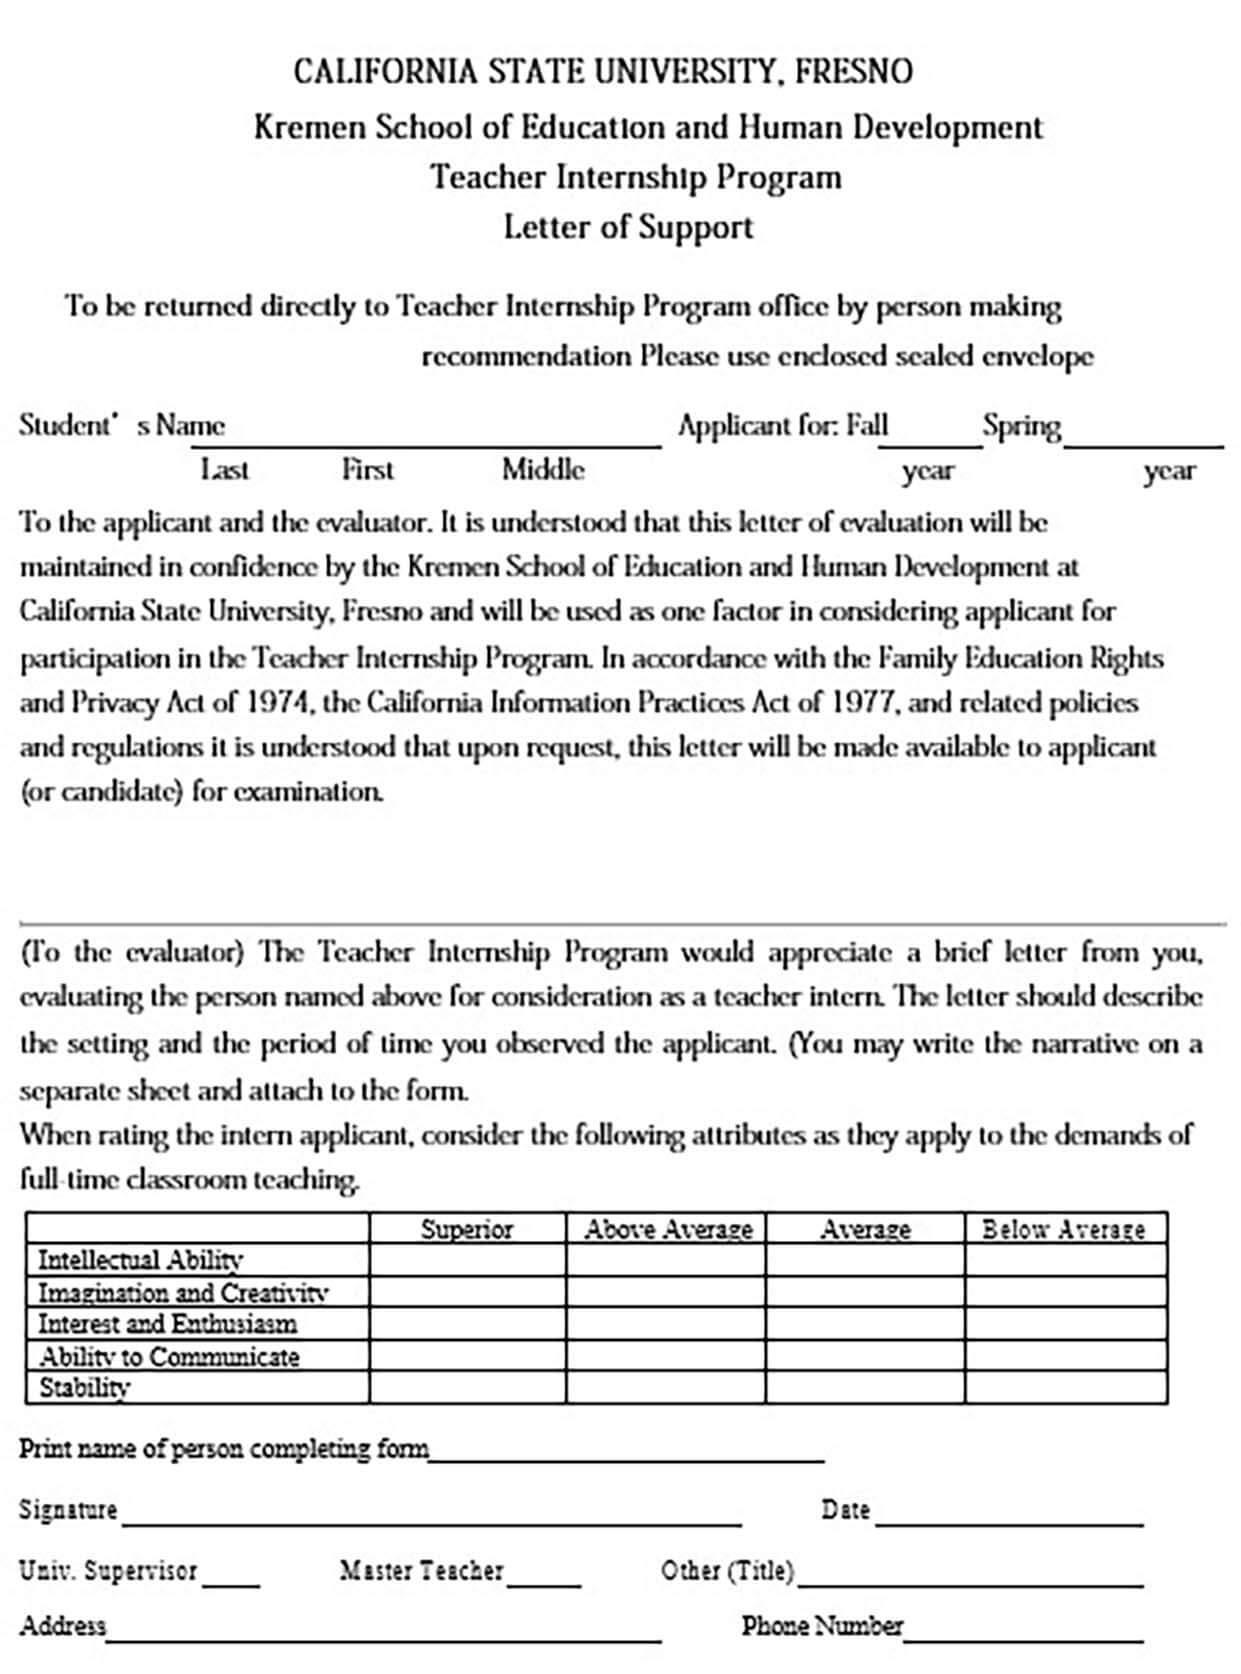 Internship Letter of Support